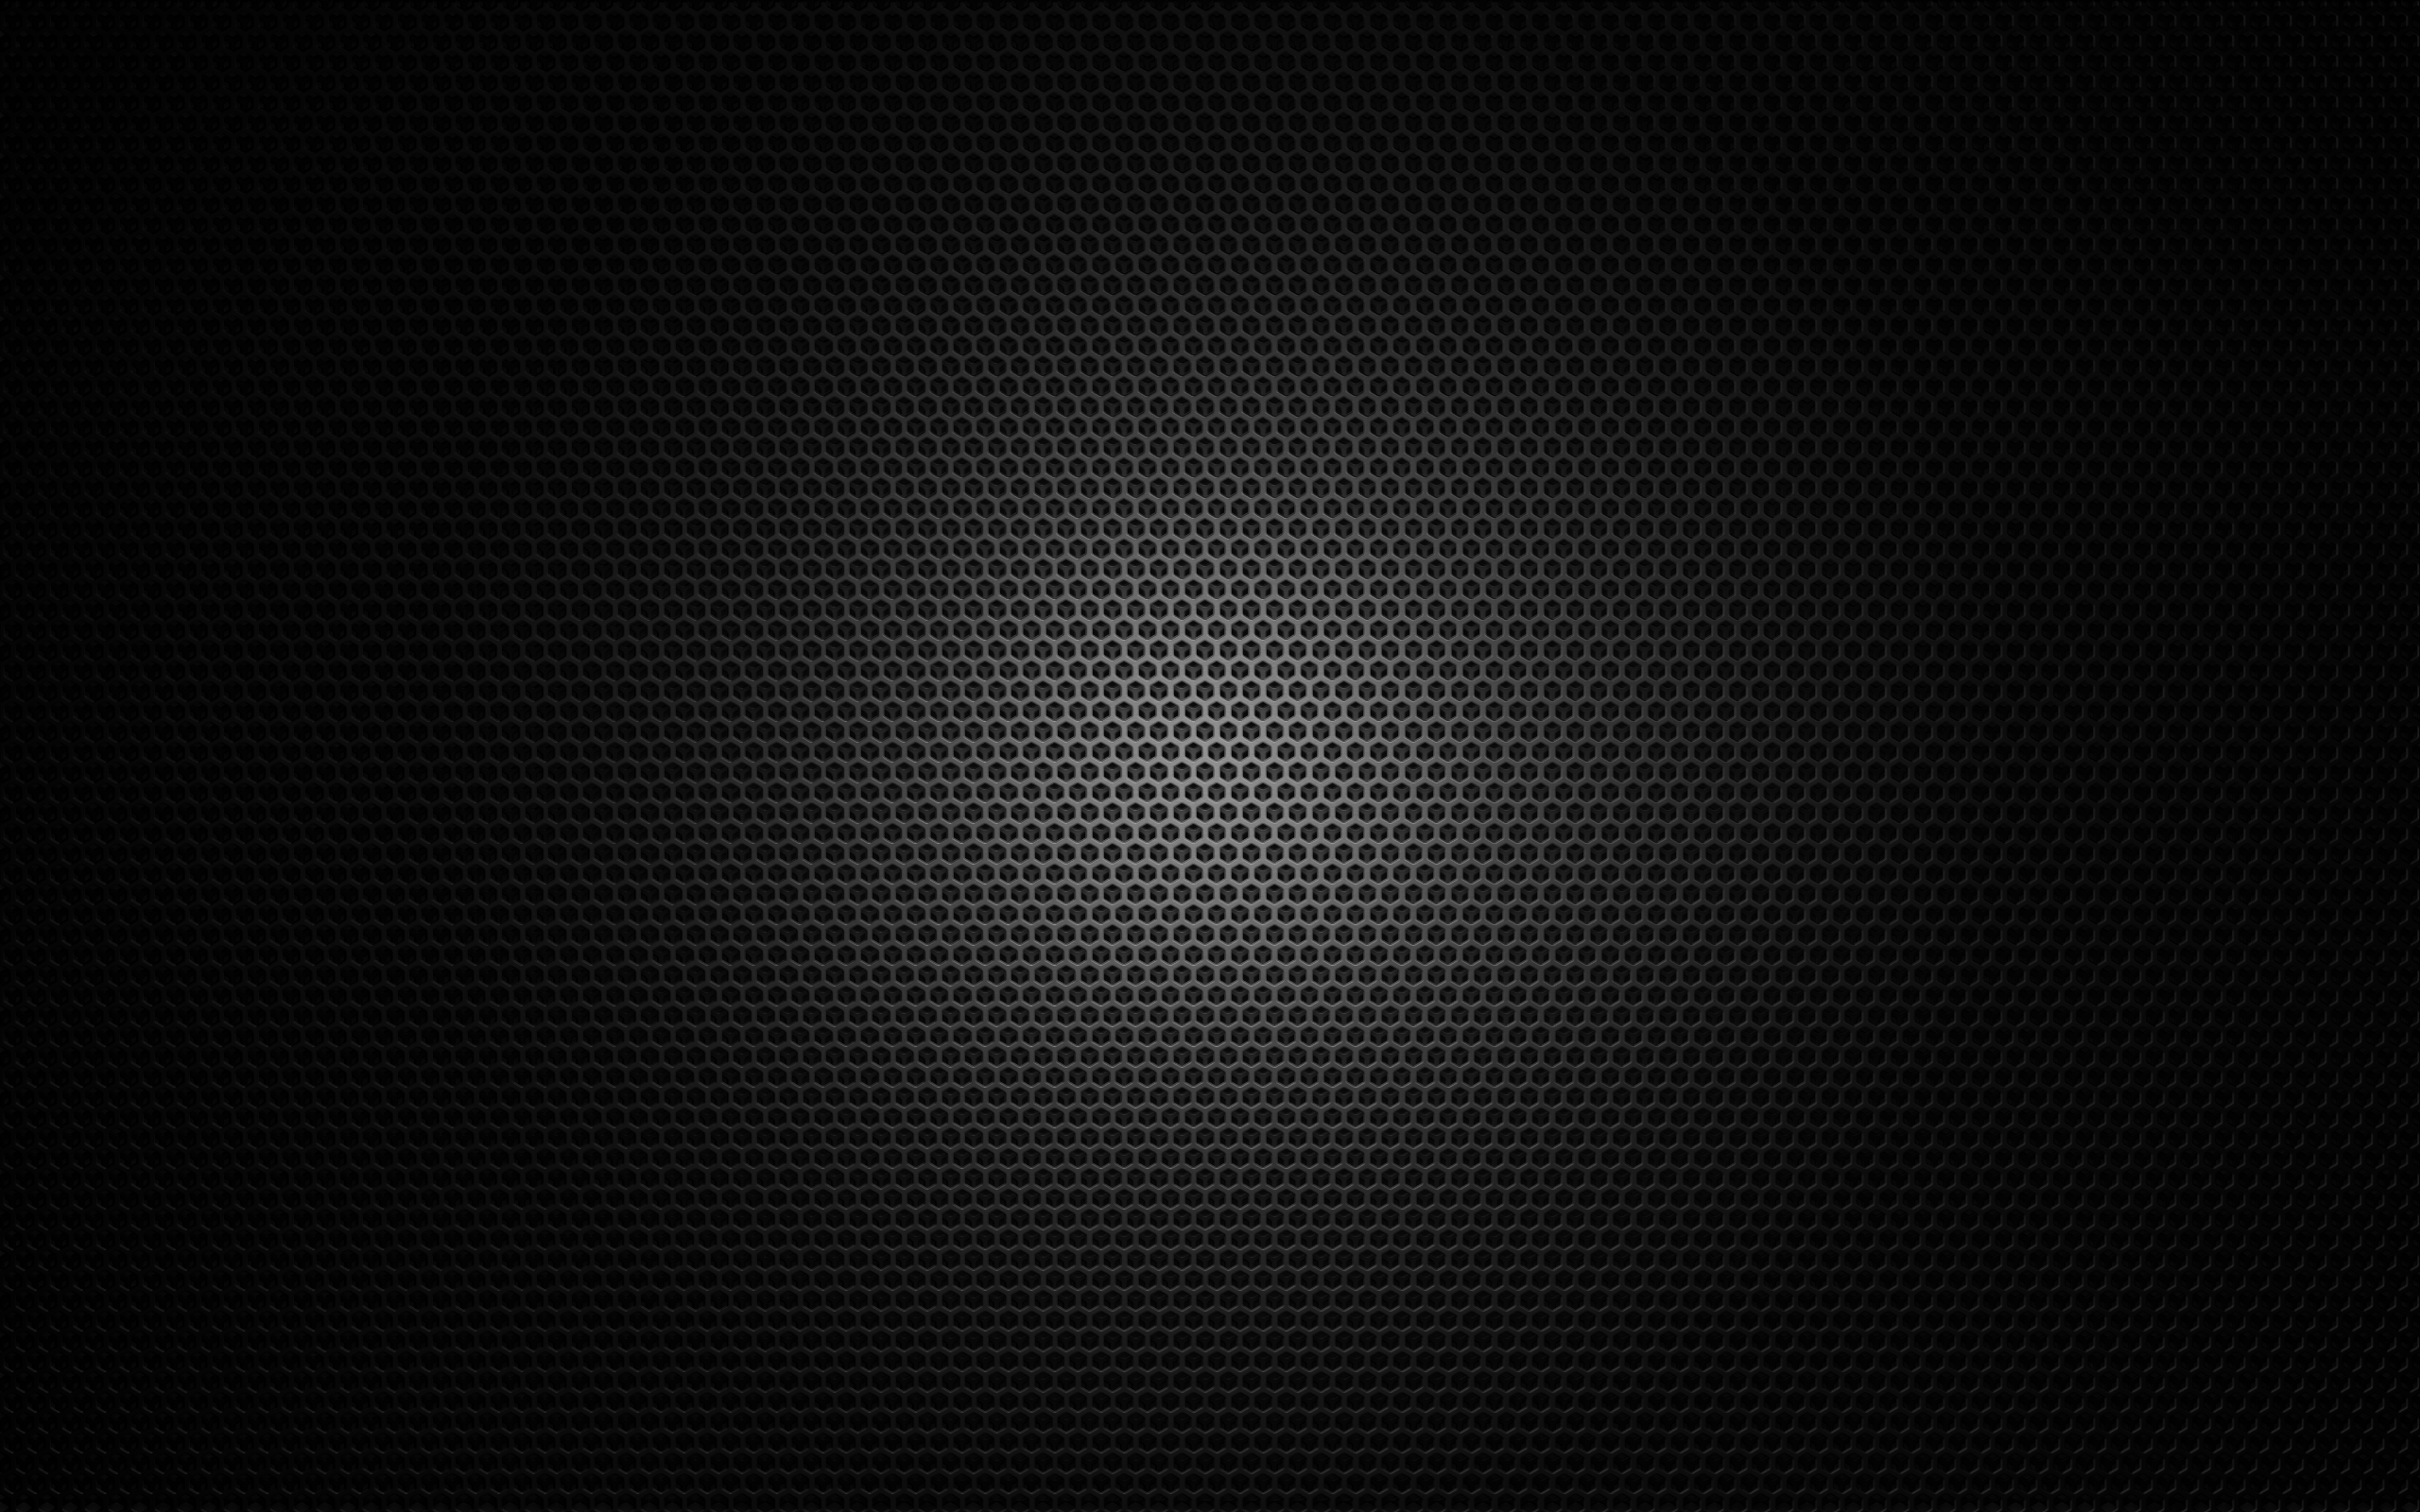 Abstract Wallpaper Set 22 « Awesome Wallpapers Ubuntu Logo Black